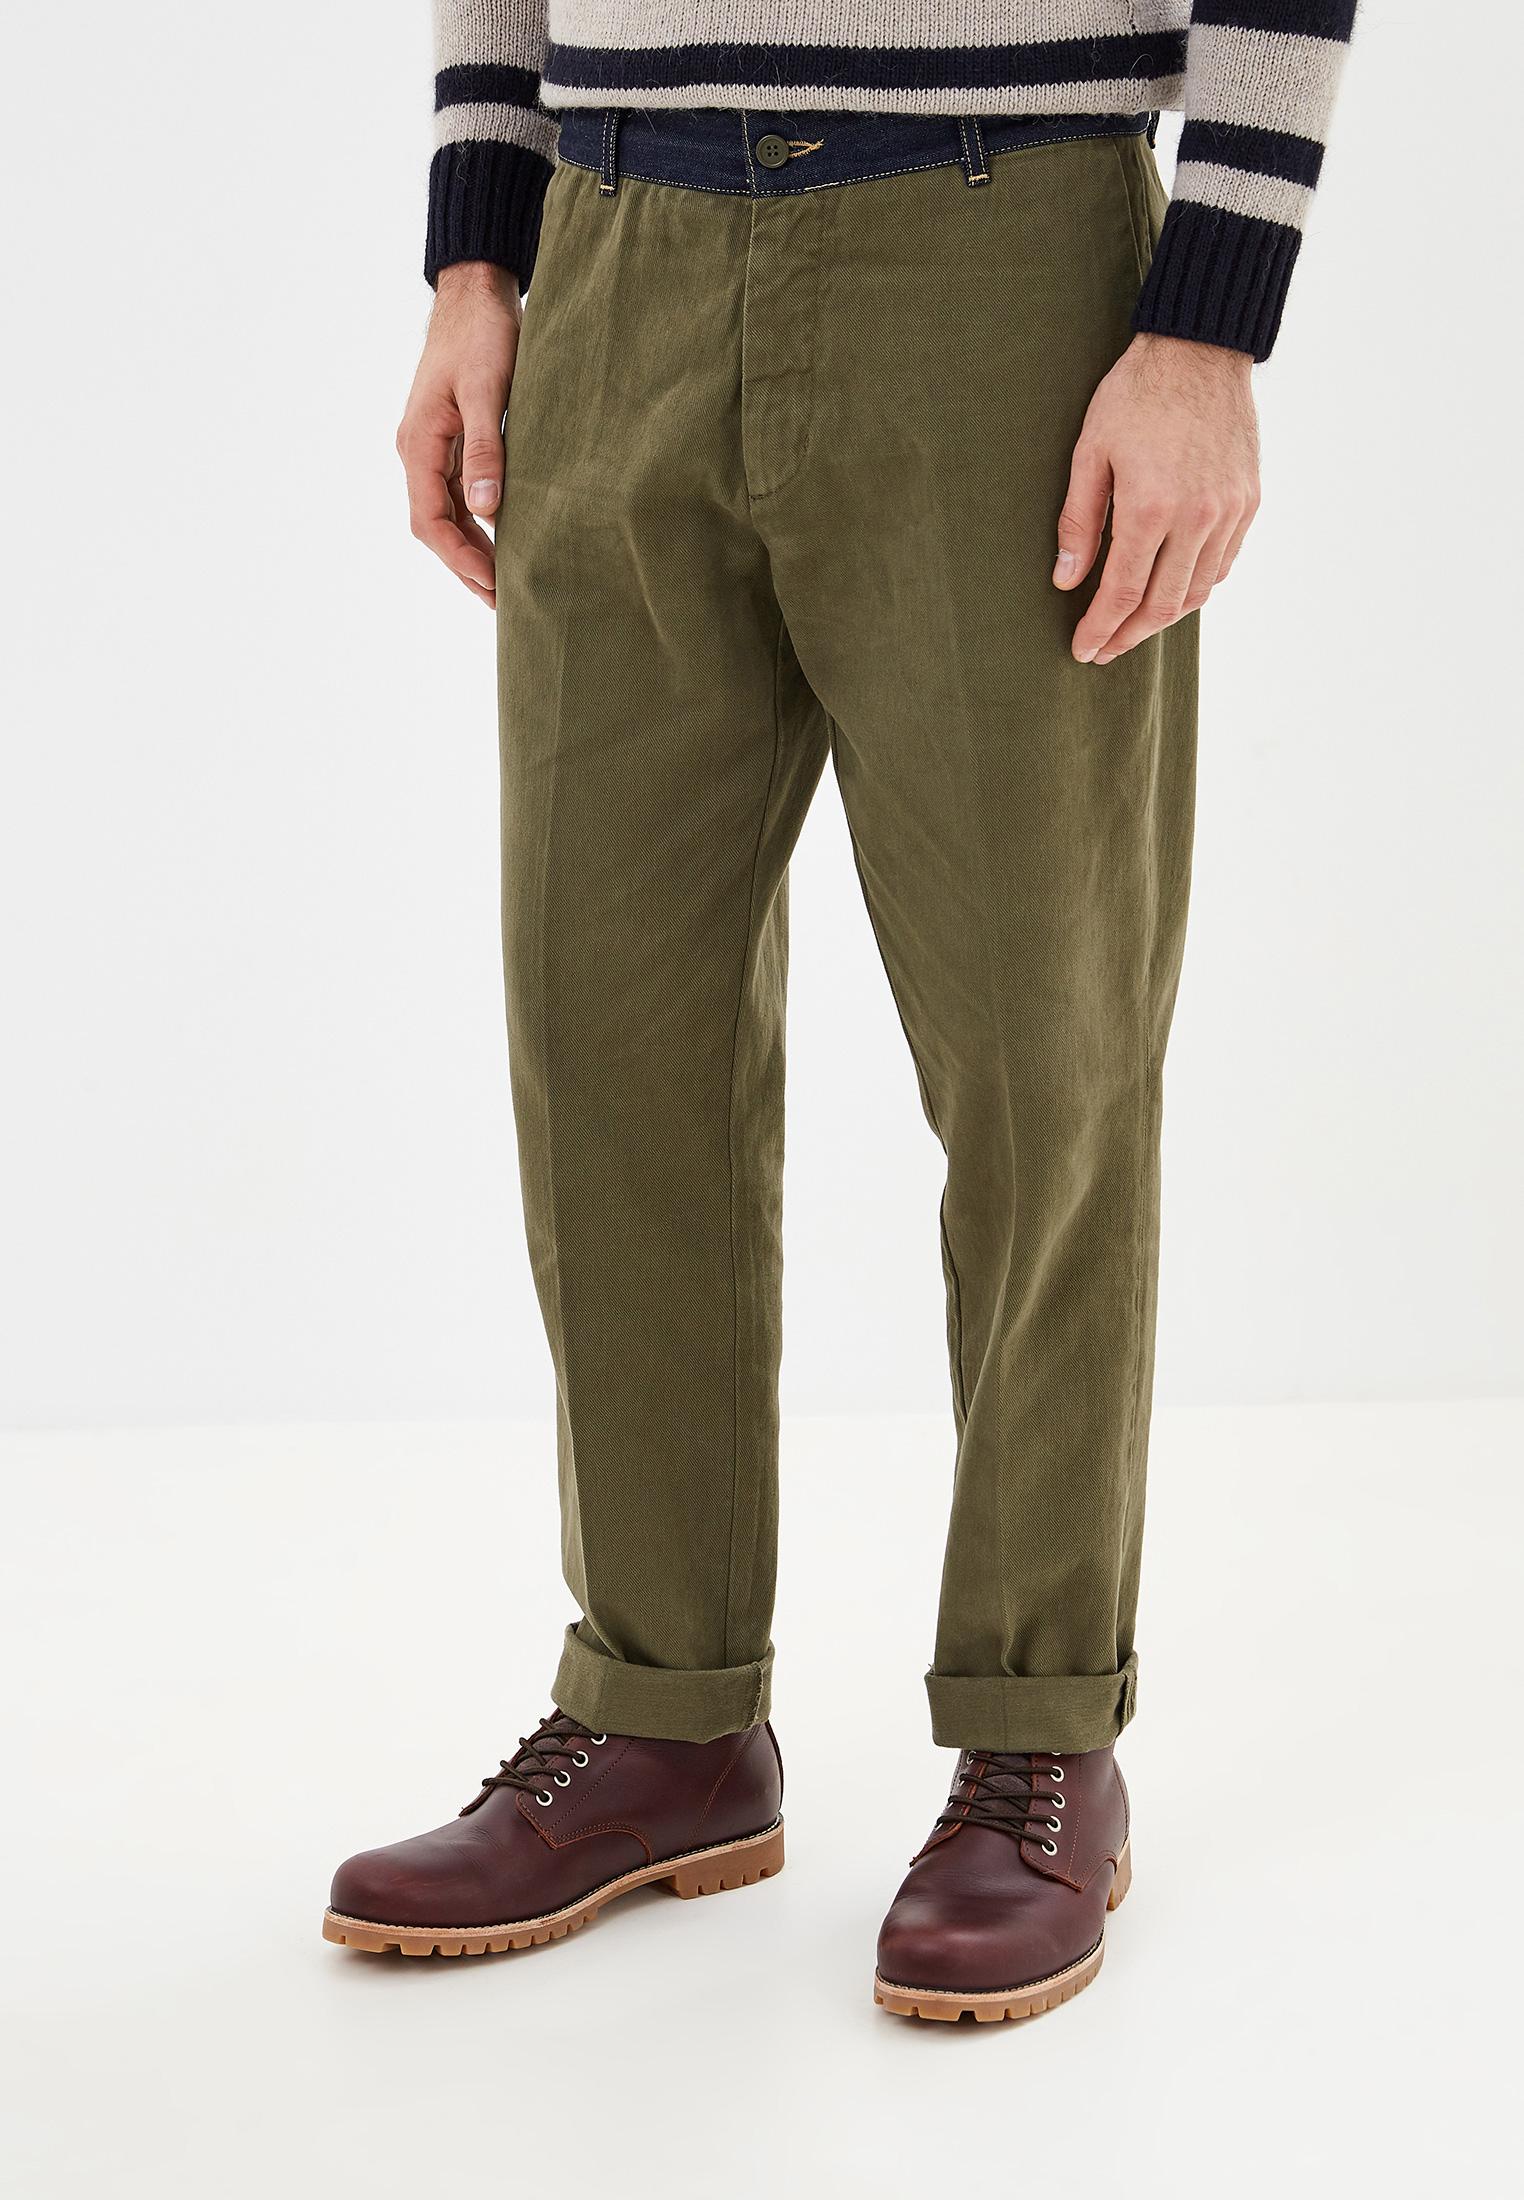 Мужские повседневные брюки United Colors of Benetton (Юнайтед Колорс оф Бенеттон) 4IH655GD8